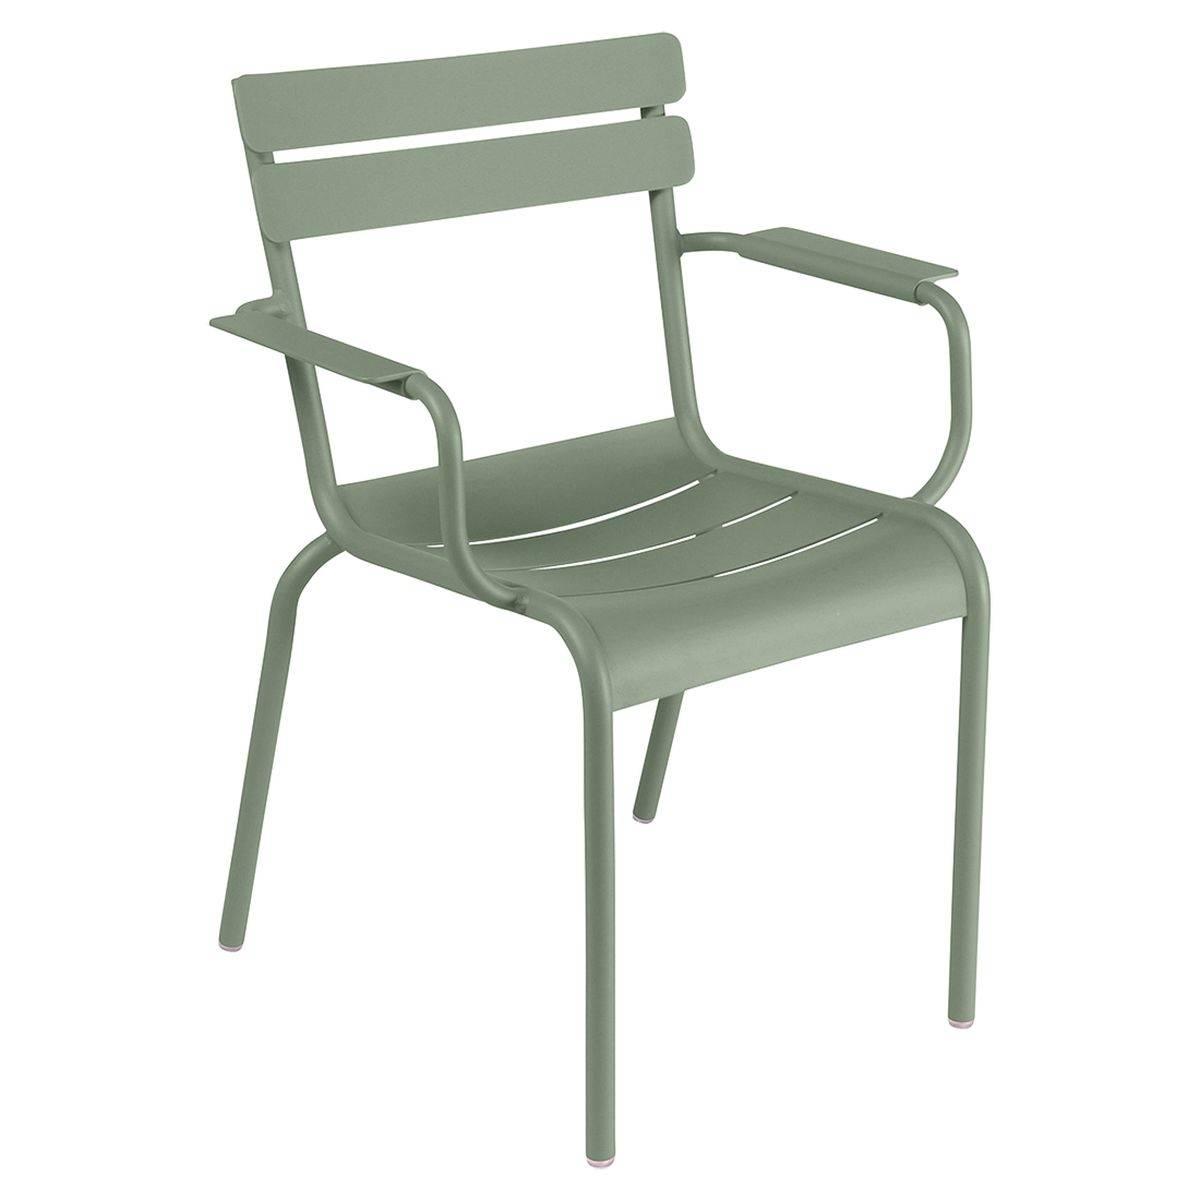 Fermob Luxembourg Armchair Outdoor Furniture Jardin Nz